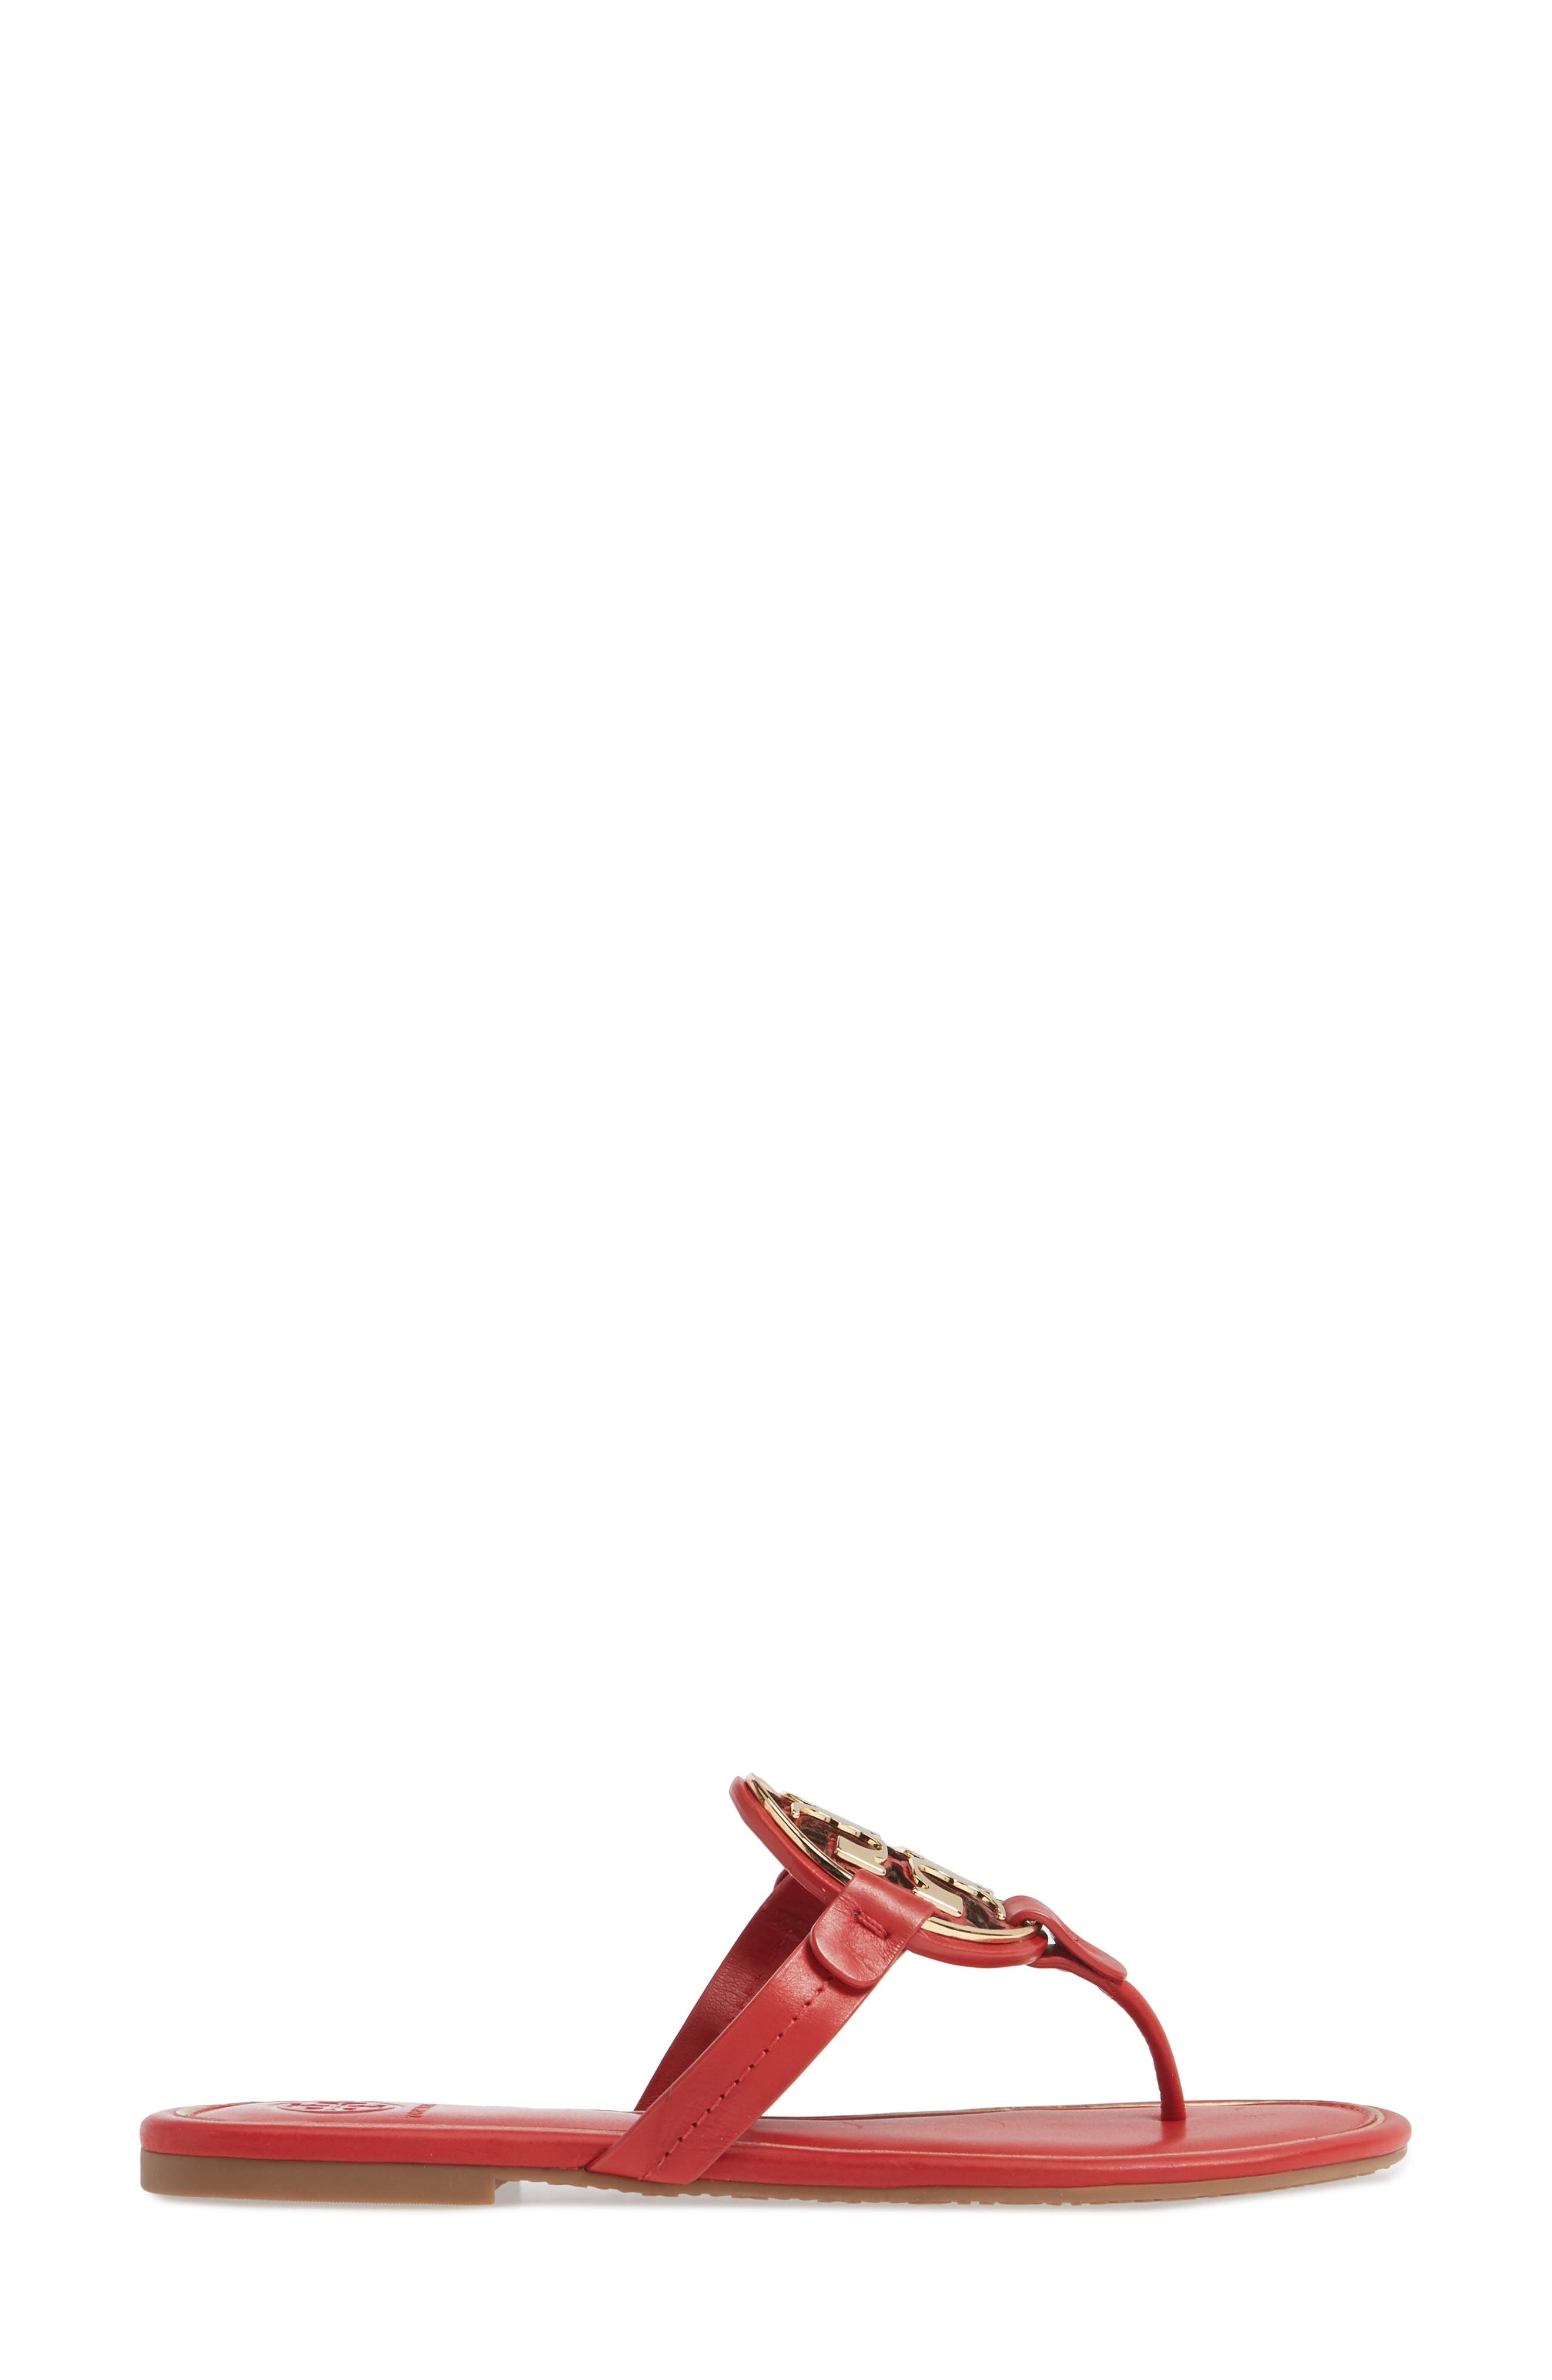 TORY BURCH, Metal Miller Flip Flop, Alternate thumbnail 3, color, BRILLIANT RED/ GOLD